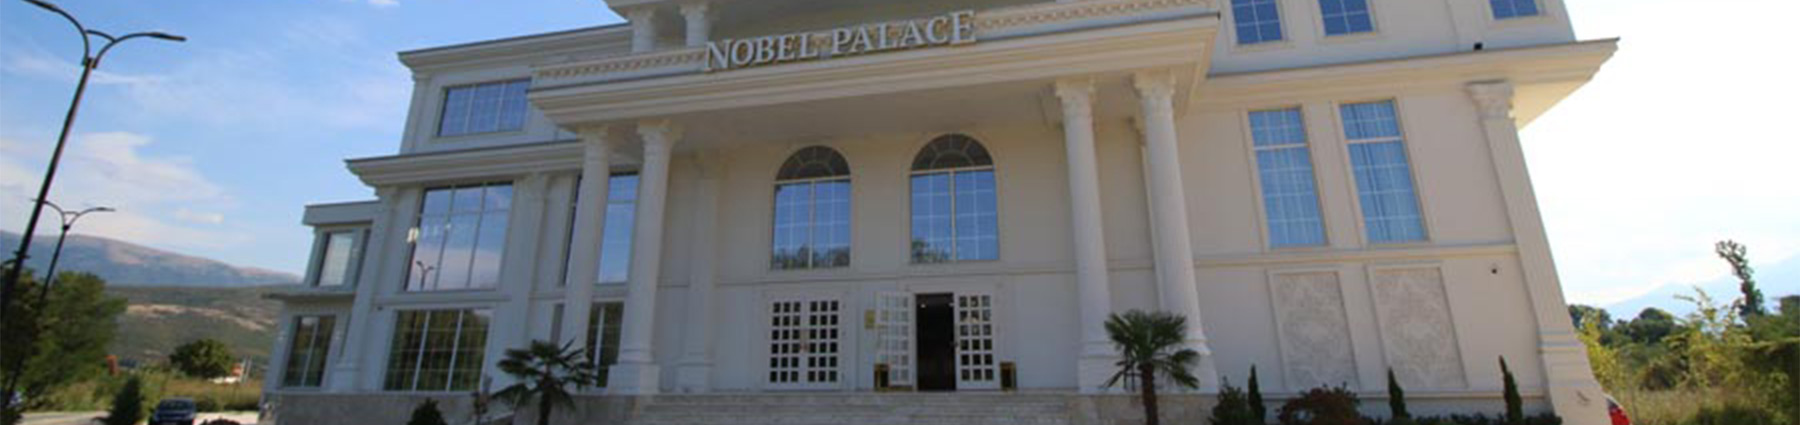 Ресторан Нобел Палас